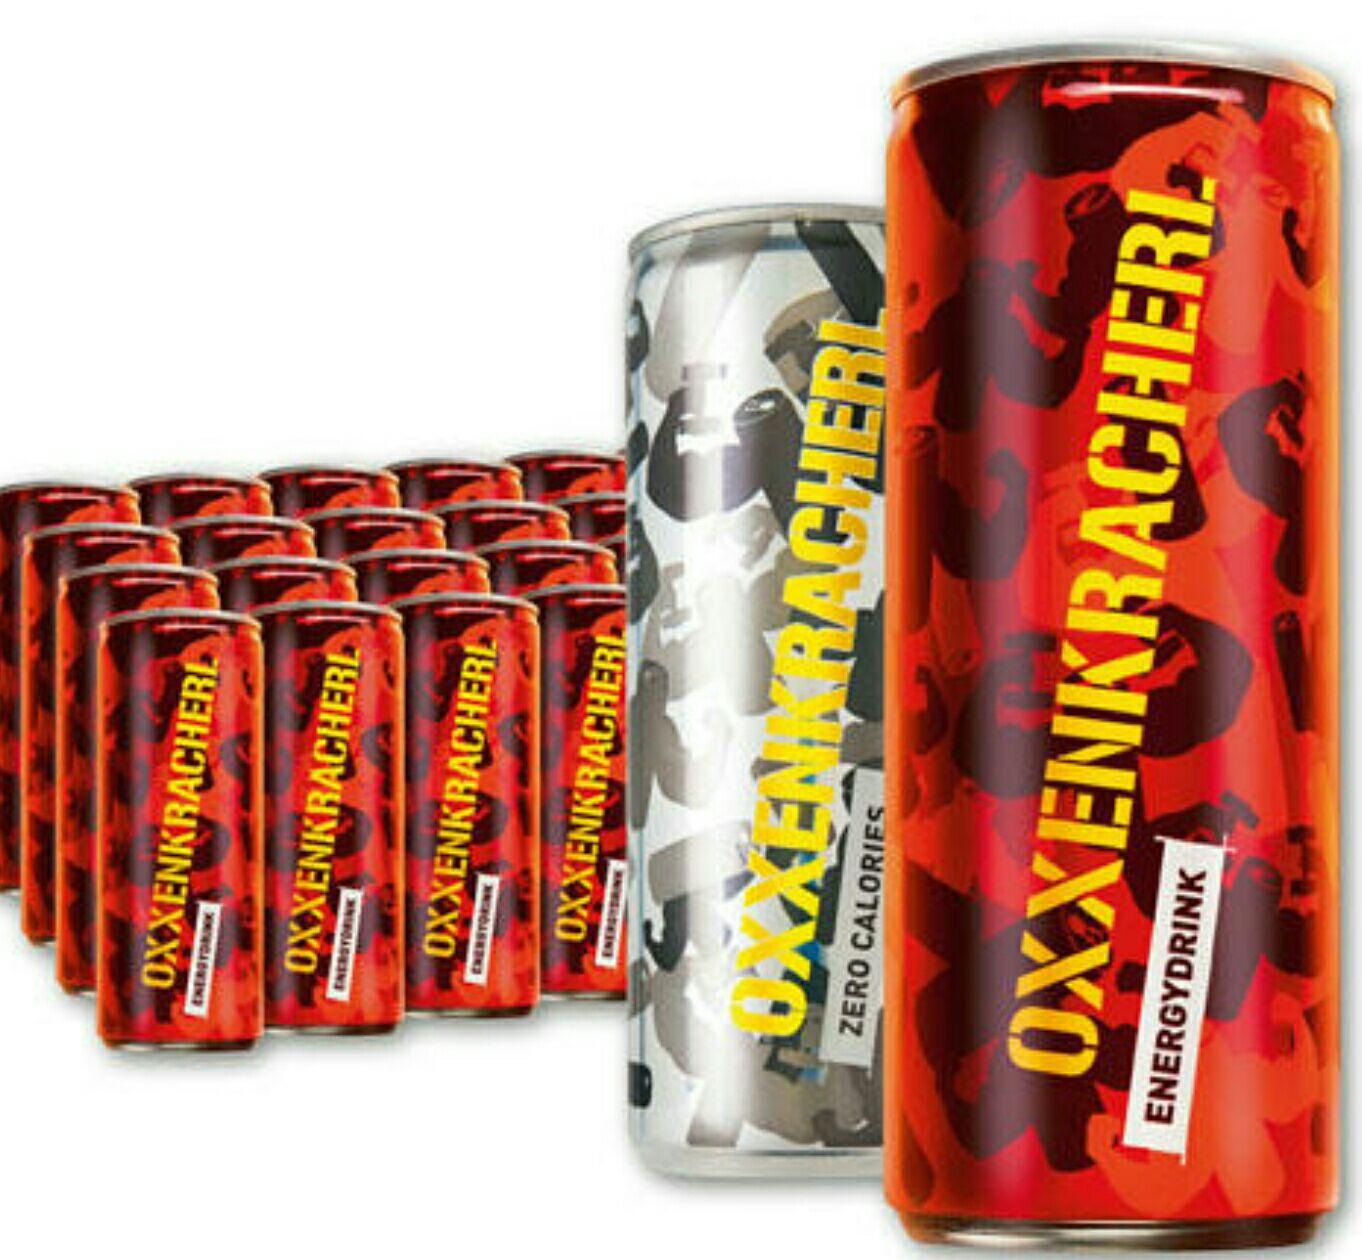 PENNY Oxxenkracherl Energy Drink um nur 0,22€ am Donnerstag 23.05.